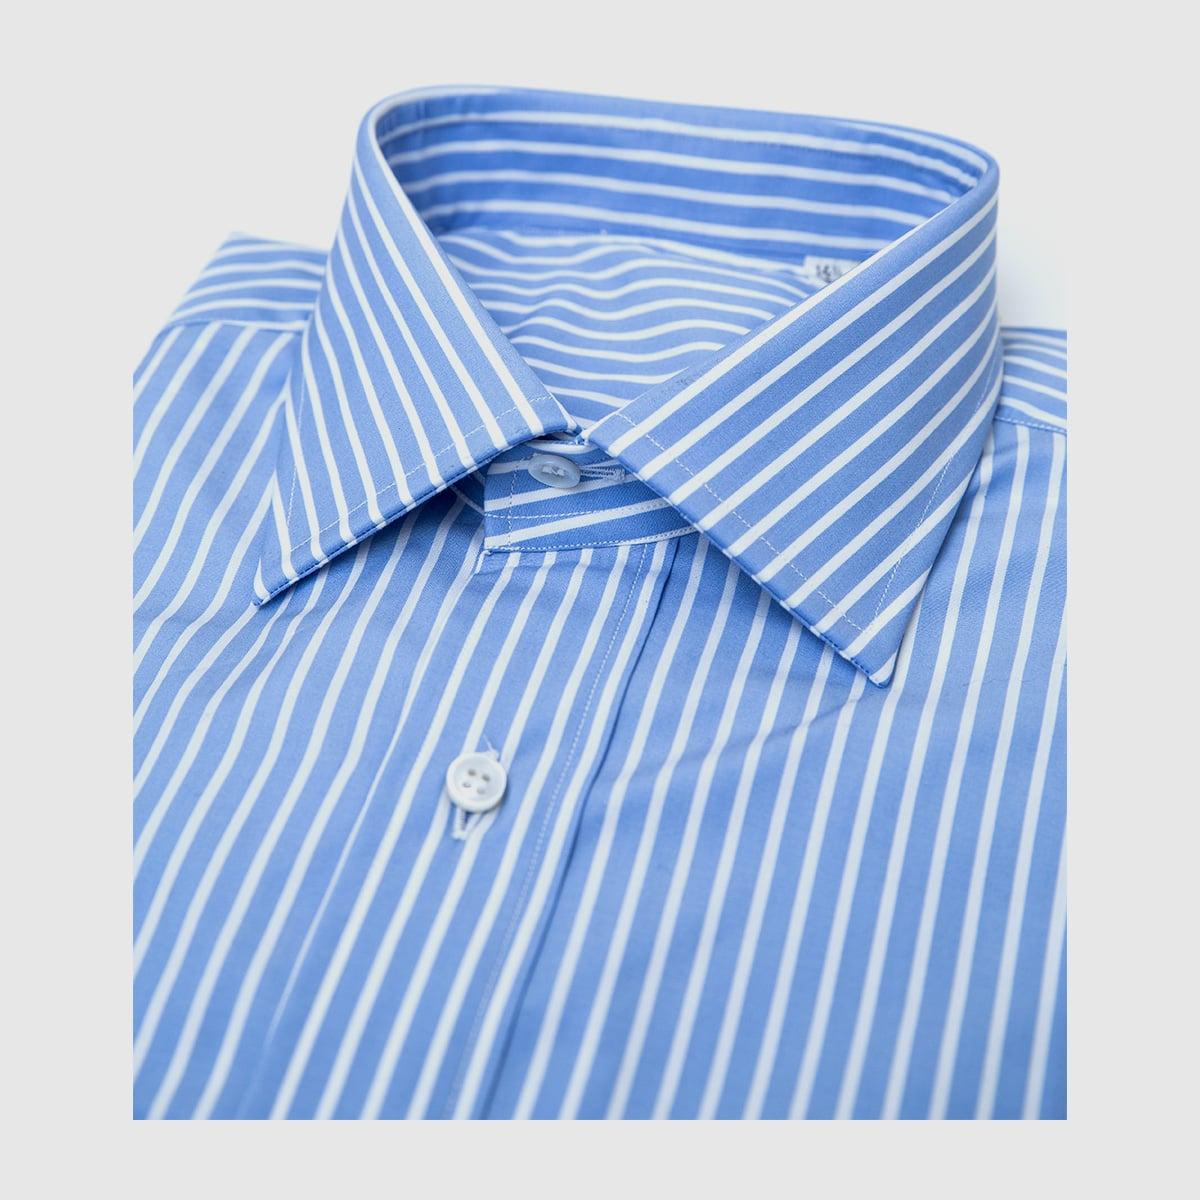 Camicia Riga bianca popeline